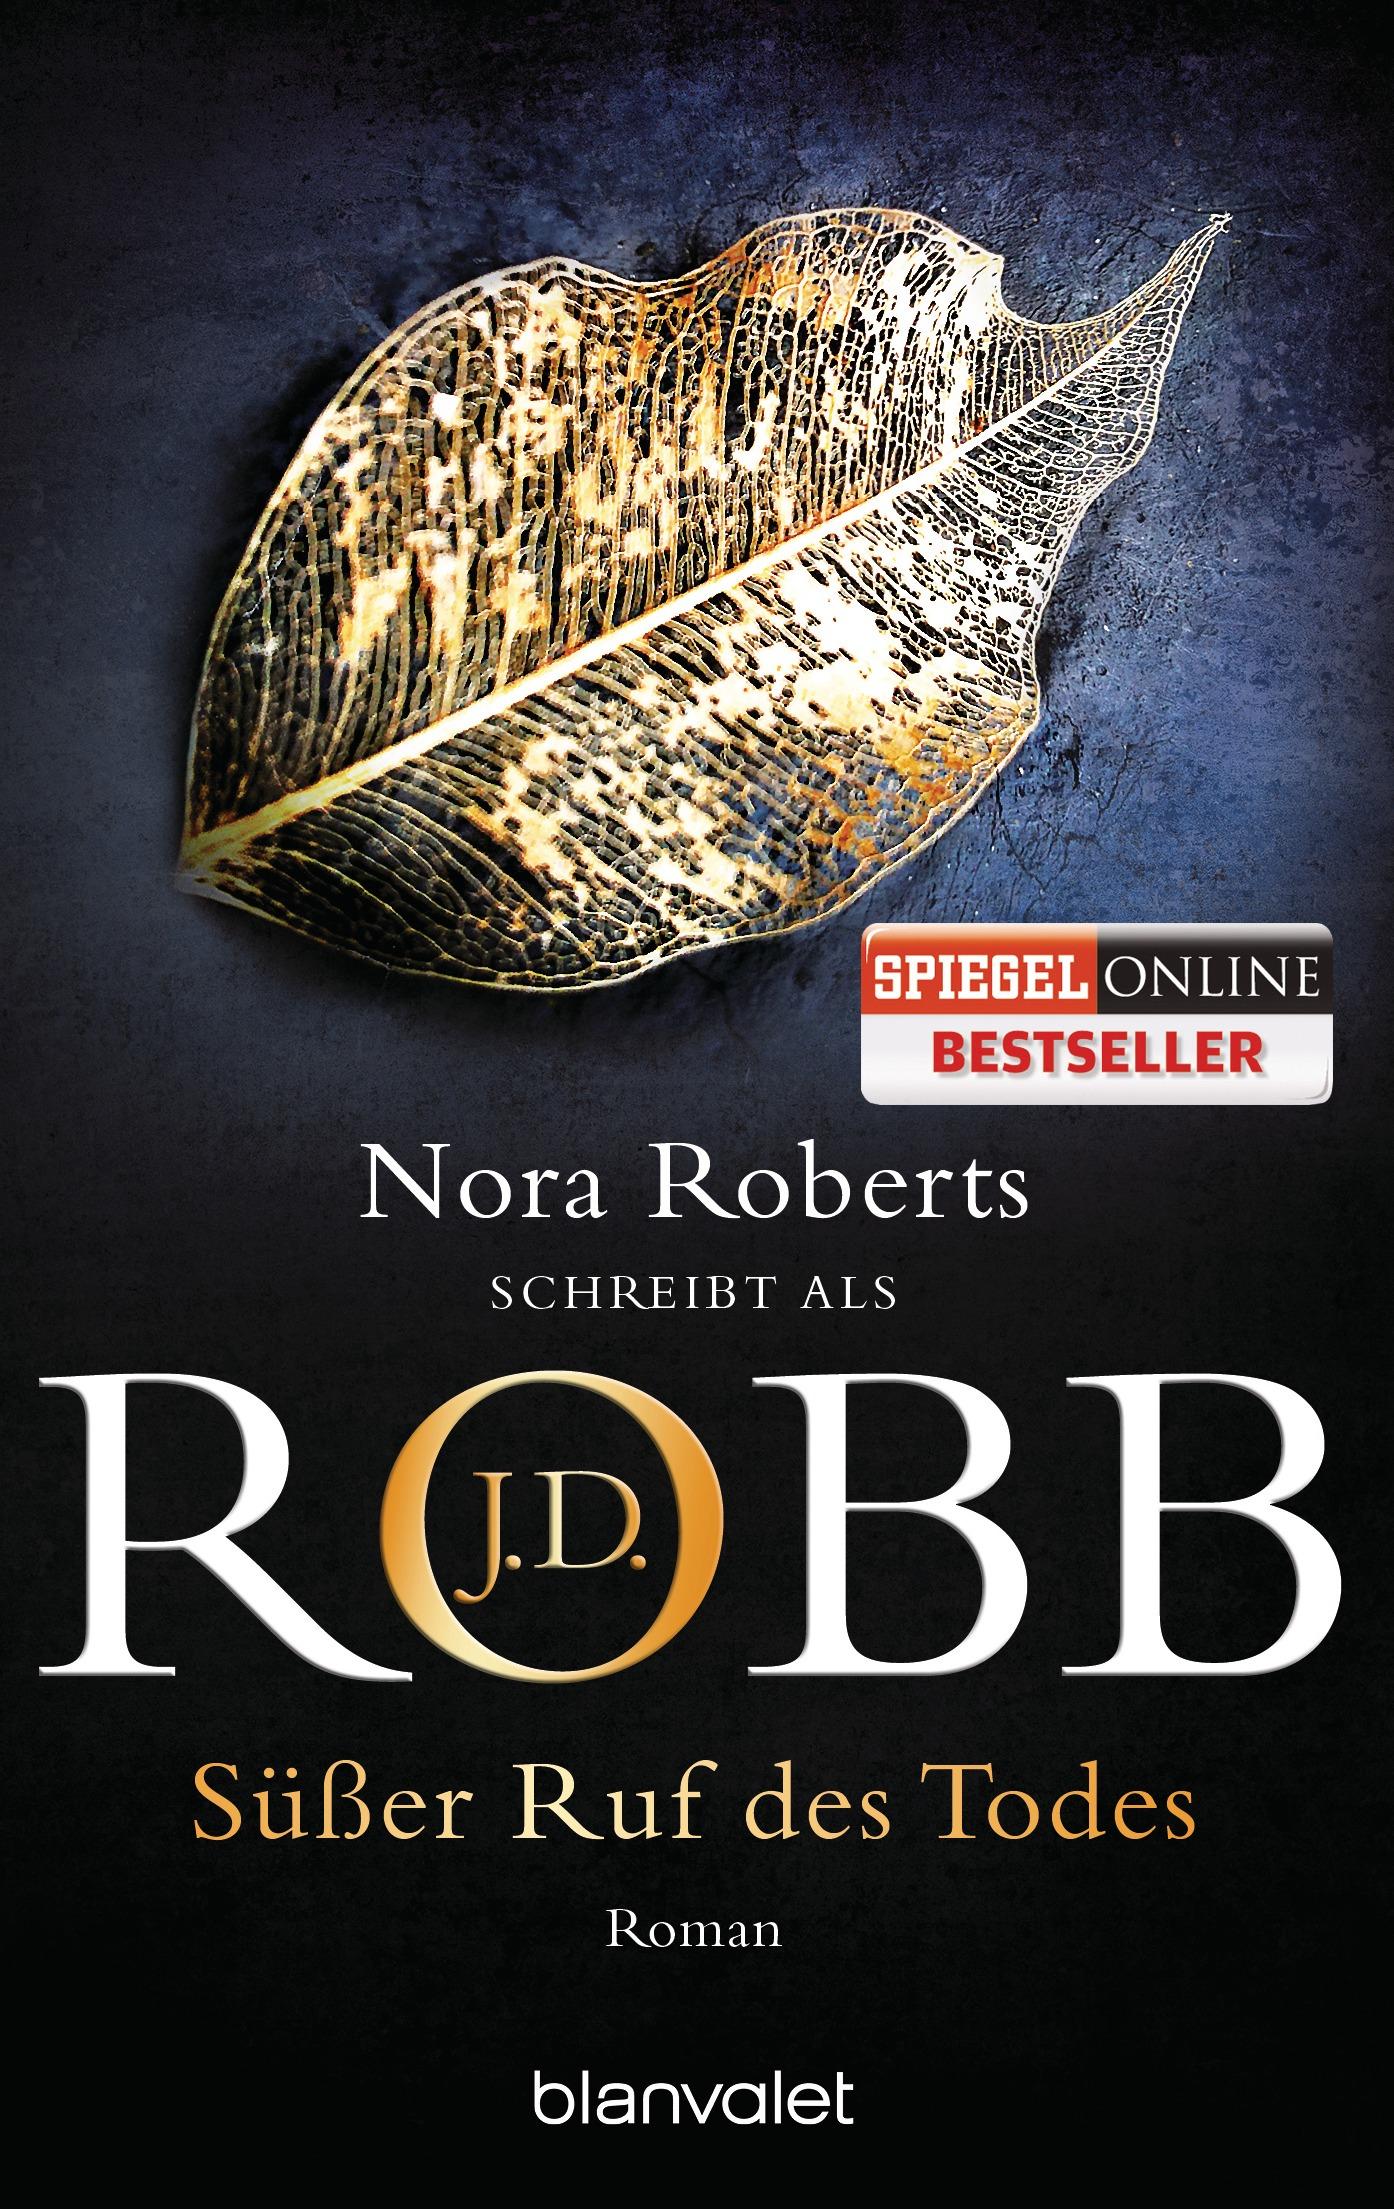 Süßer Ruf des Todes, J. D. Robb